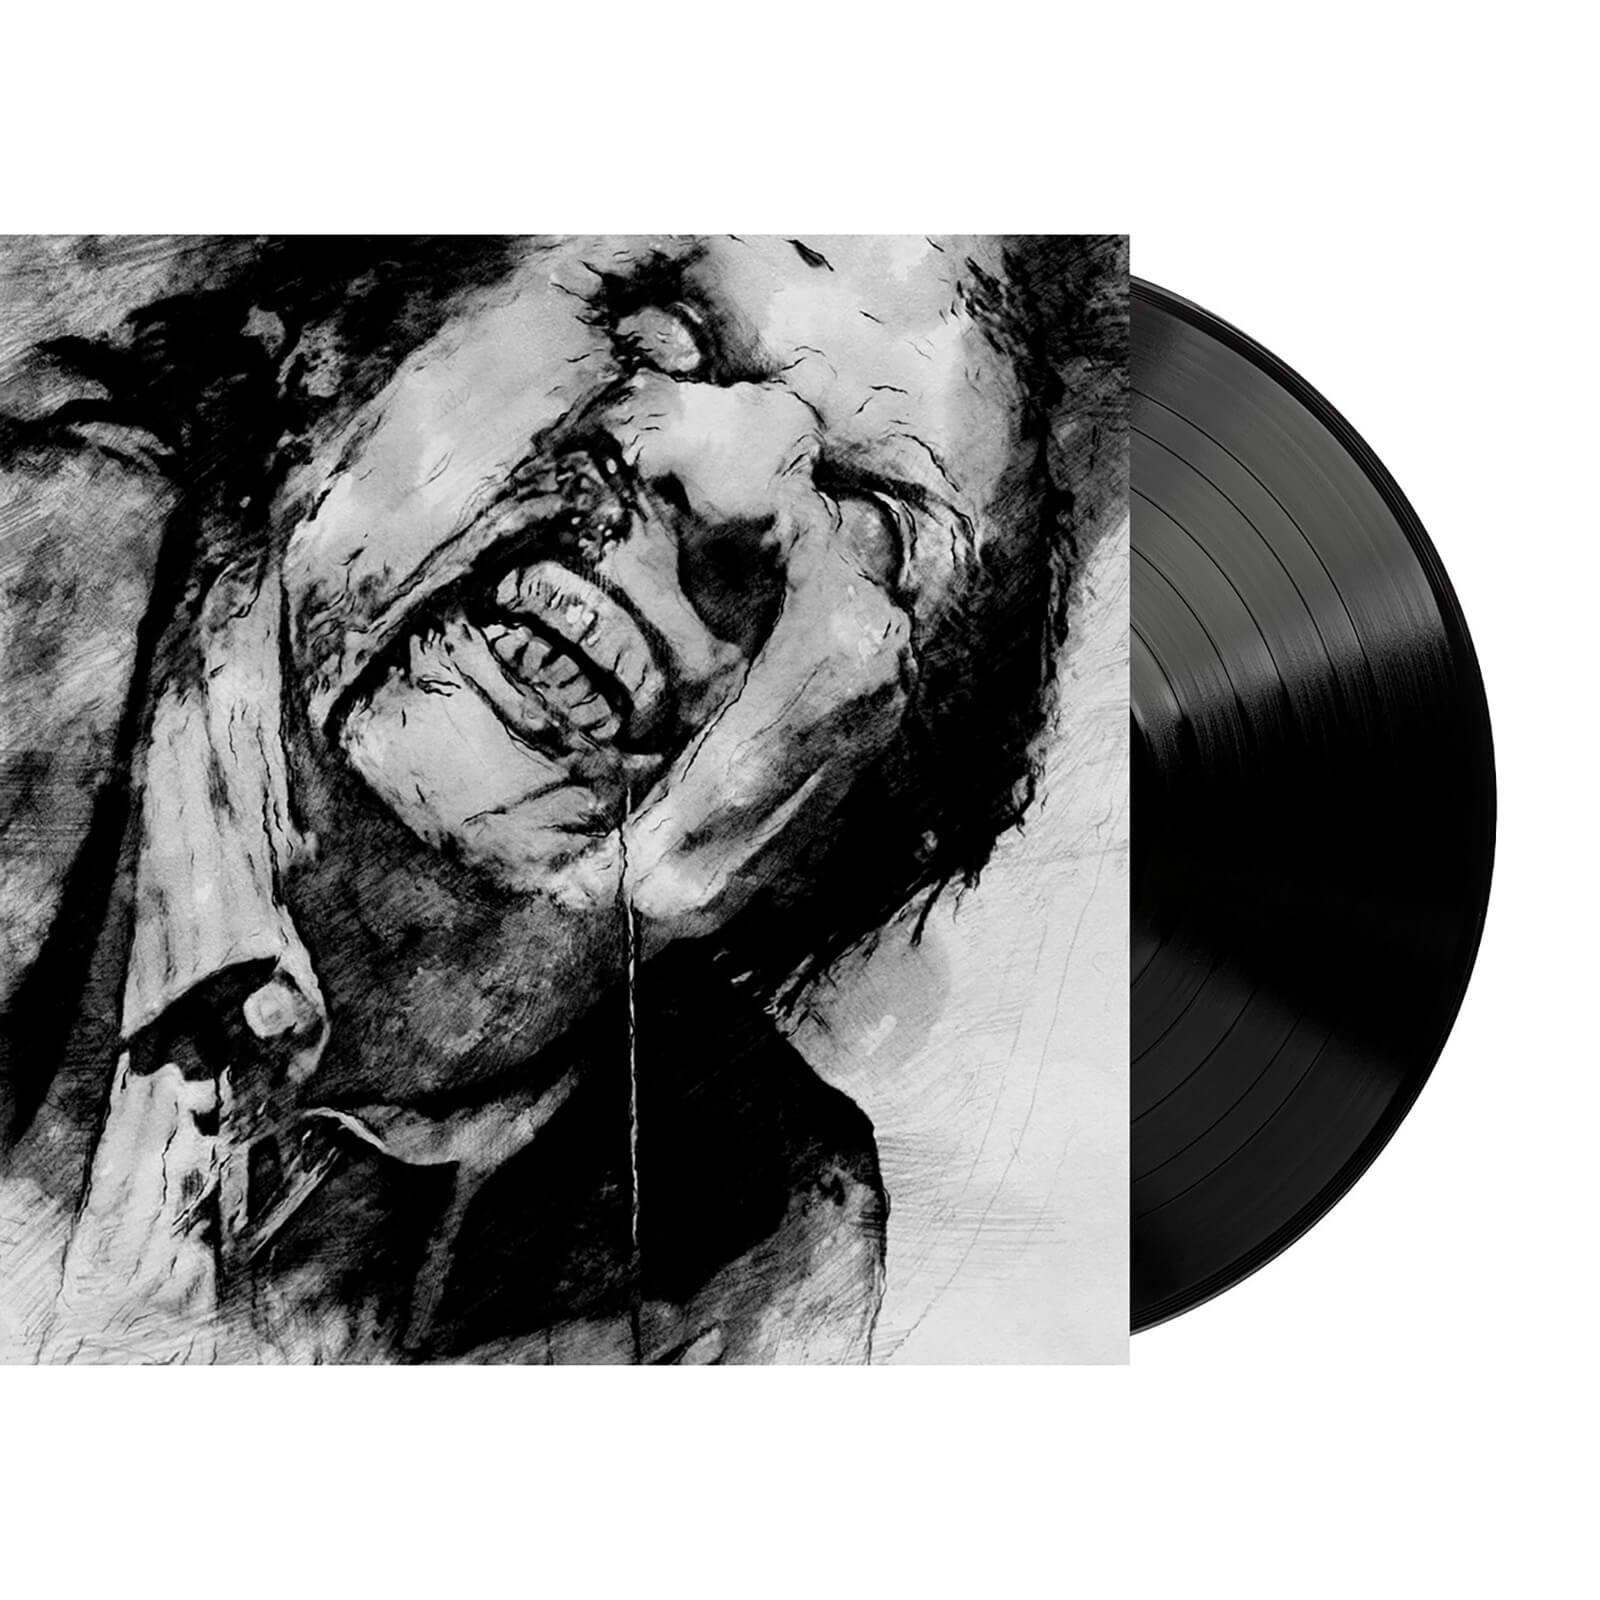 Strange Disc Night Of The Living Dead (Original 1990 Motion Picture Soundtrack) 2xLP